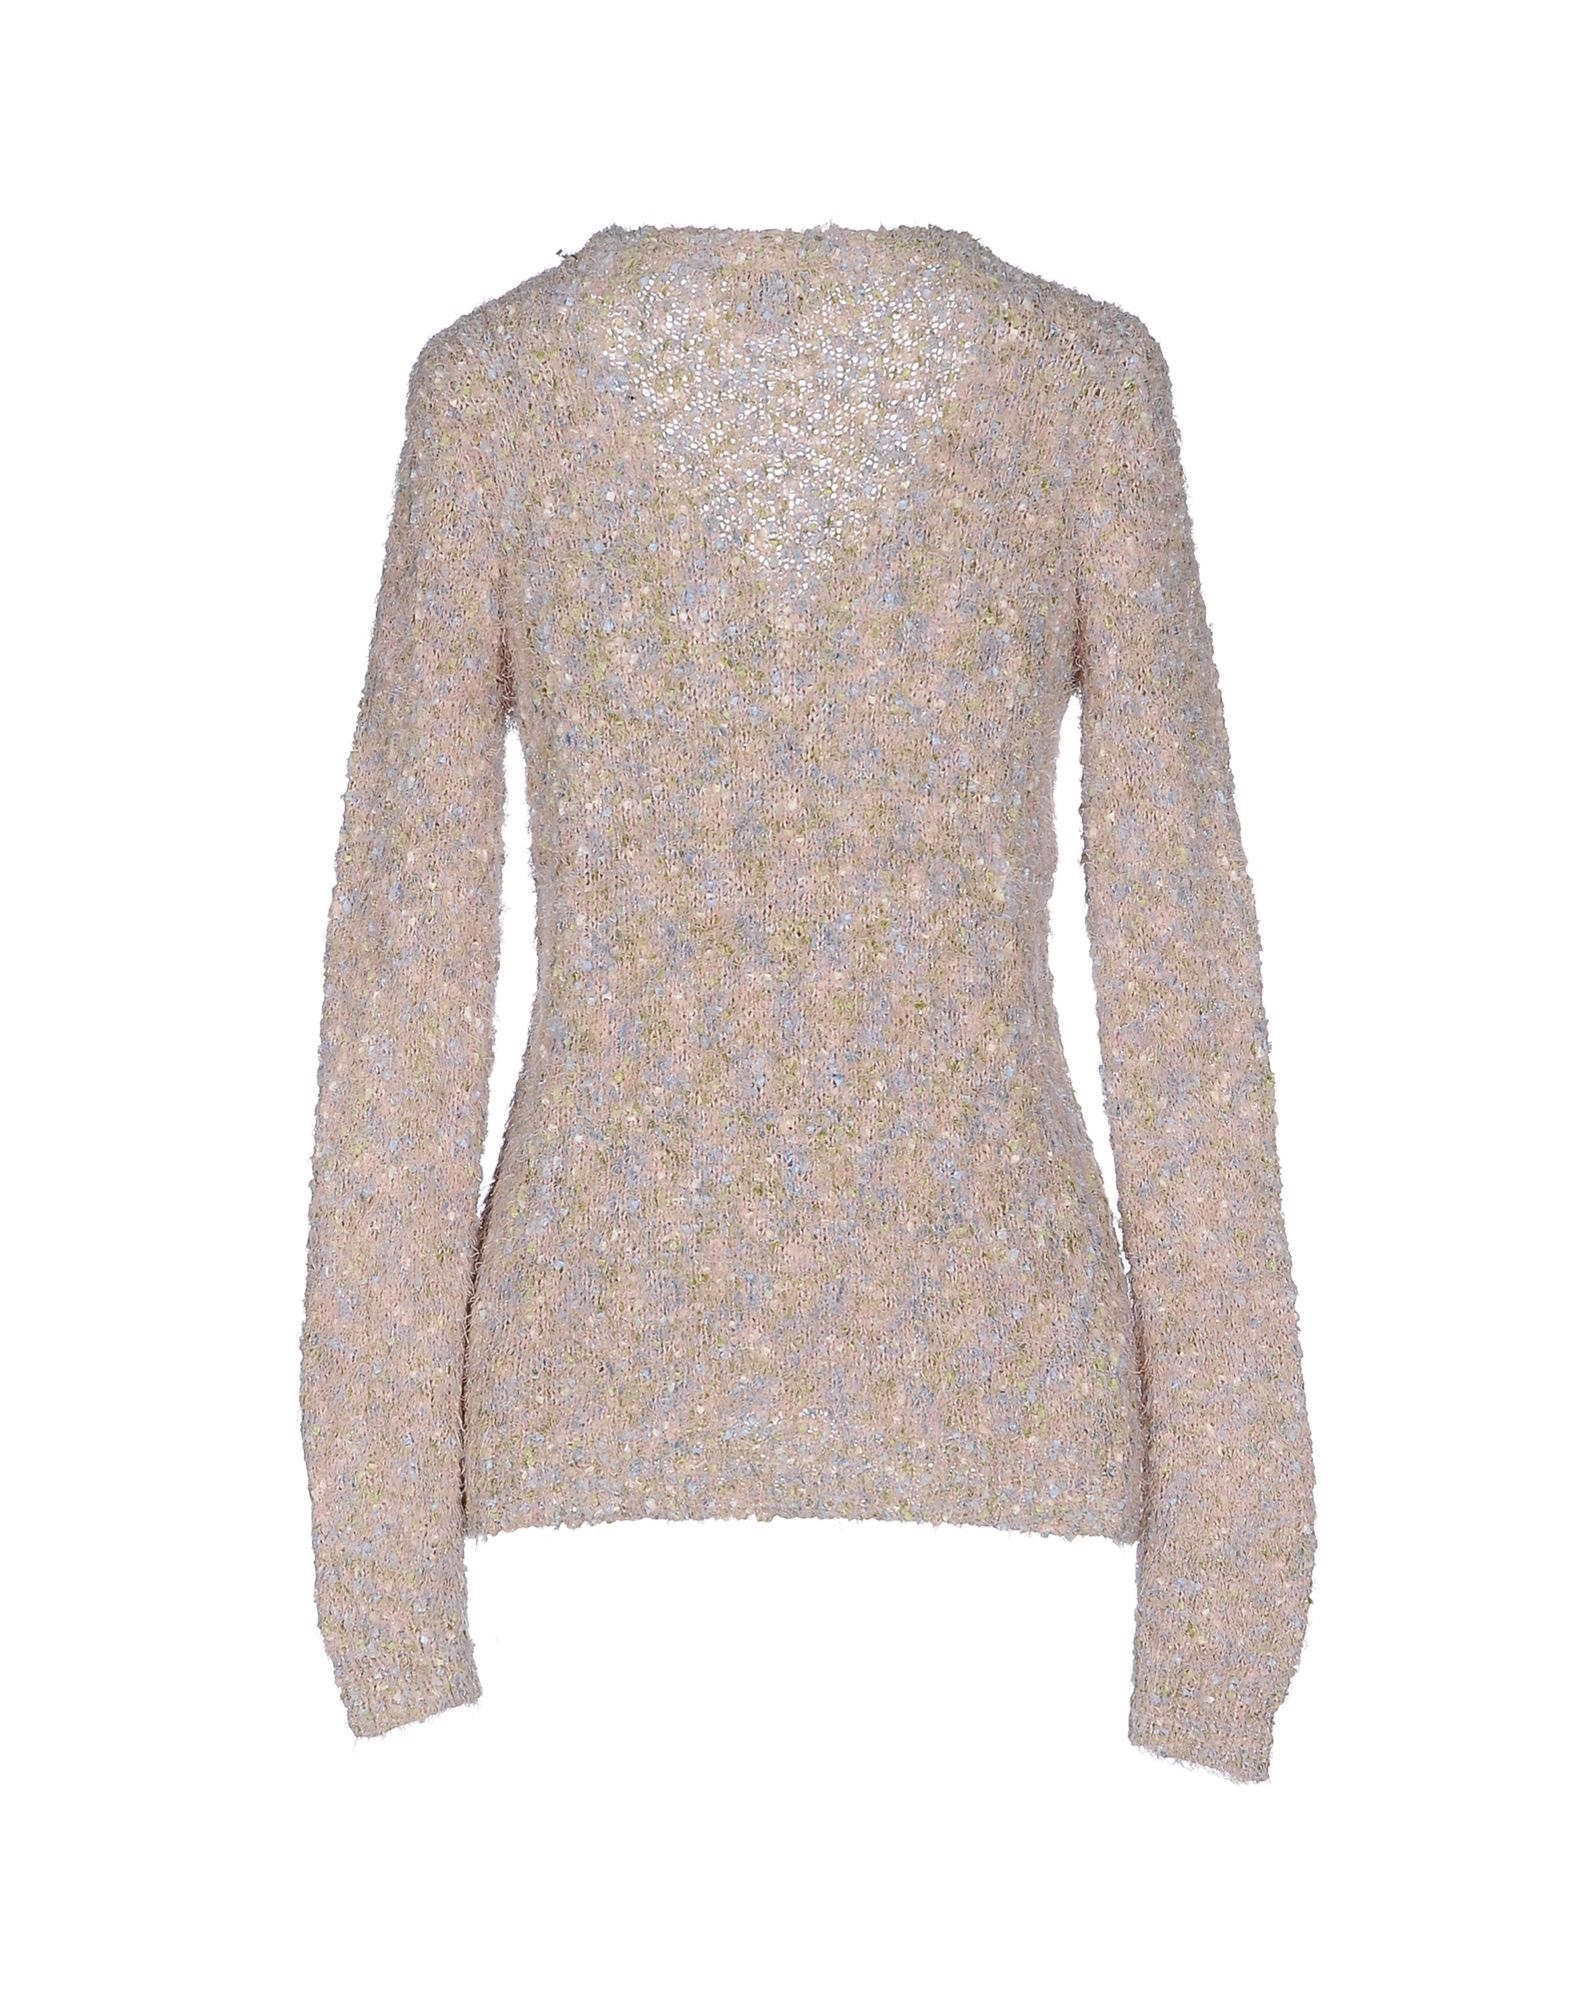 Vero Moda Knitting Patterns : Vero moda cardigan in natural lyst